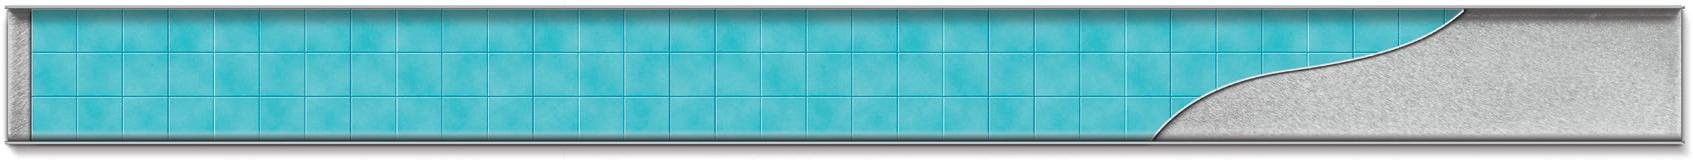 Водоотводящие желоба для монтажа к стене - floor-reshetka-glyanets - miroslav-chudej-s-r-o - 350-x-415 - 1-2 - 1 - 200 - czech-republic